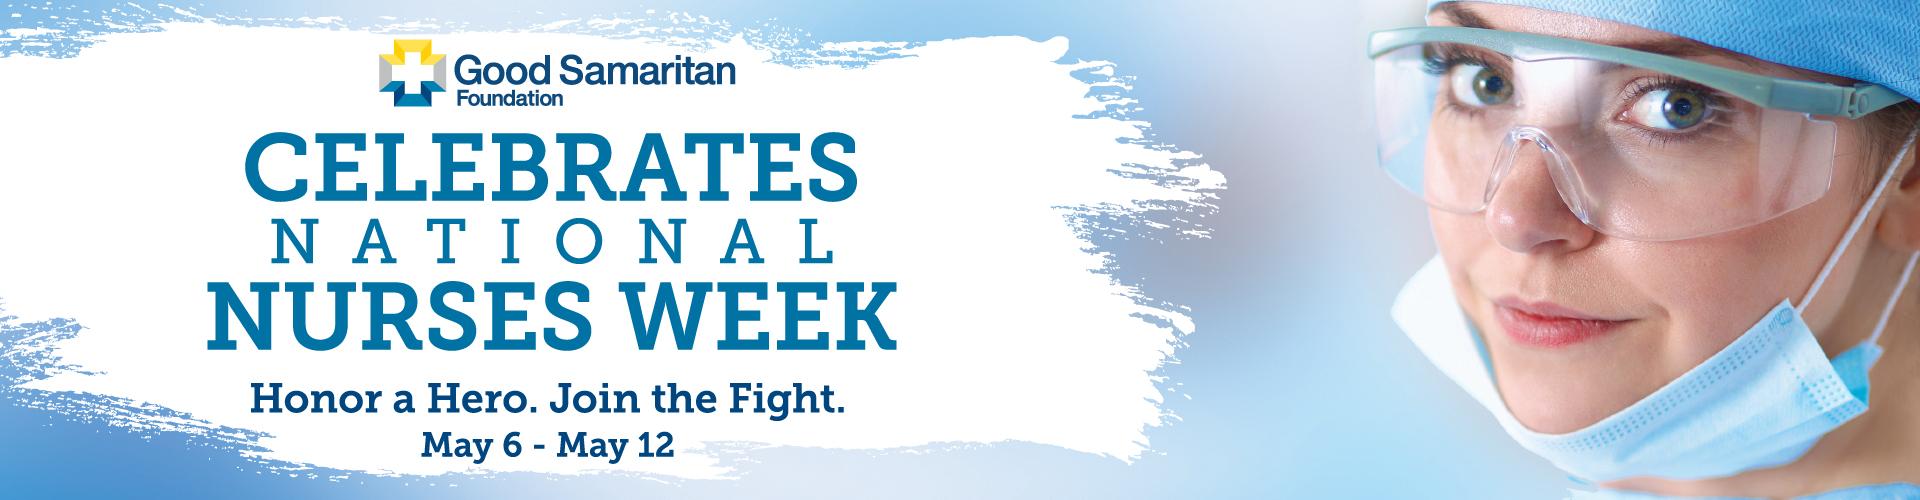 Good Samaritan Foundation Celebrates National Nurses Week